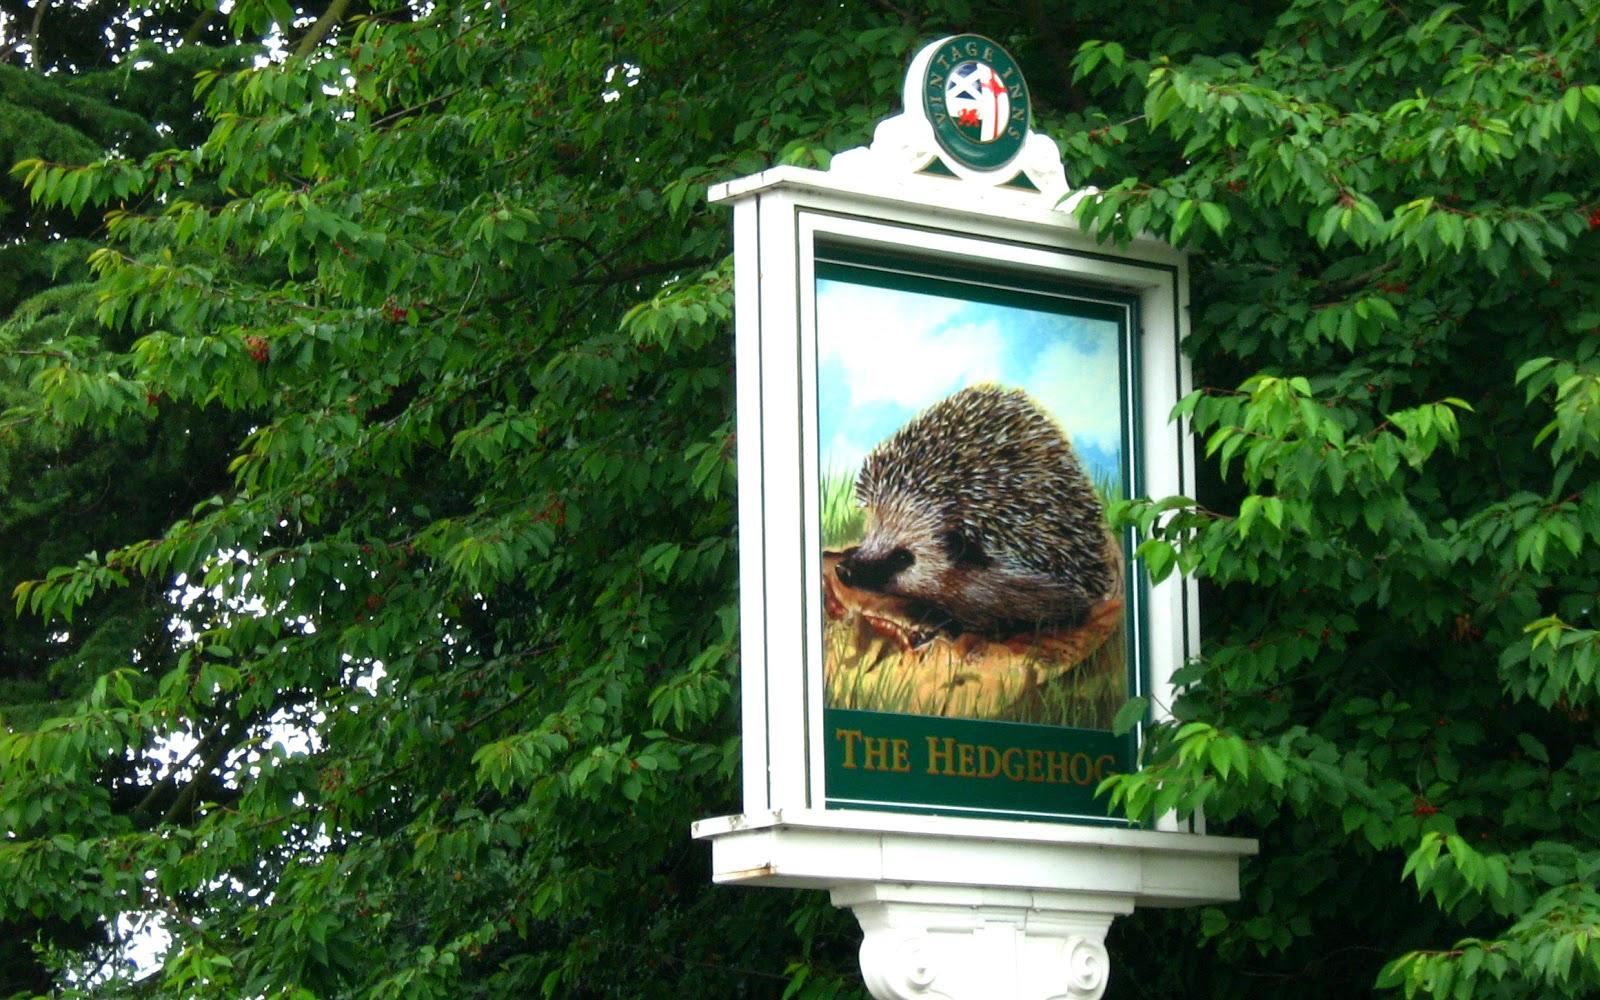 Hedgehog Pub sign